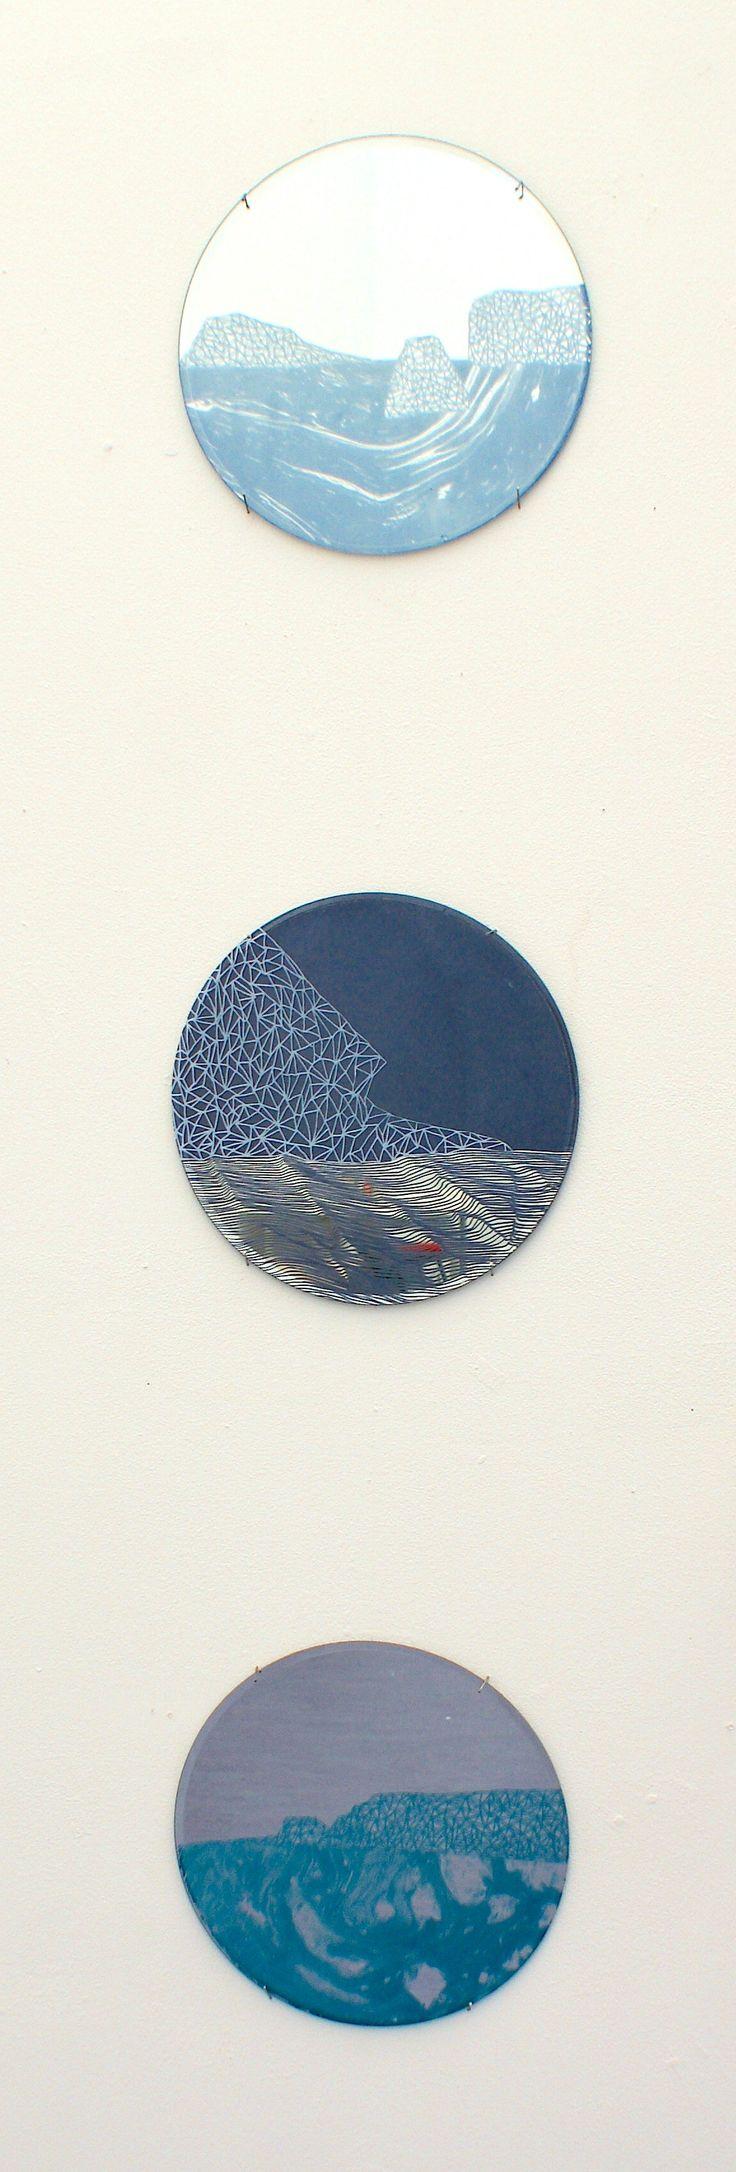 Chloe - Landscape - Screen print on mirrors Truro College A2 Fine Art Coursework Show 2017